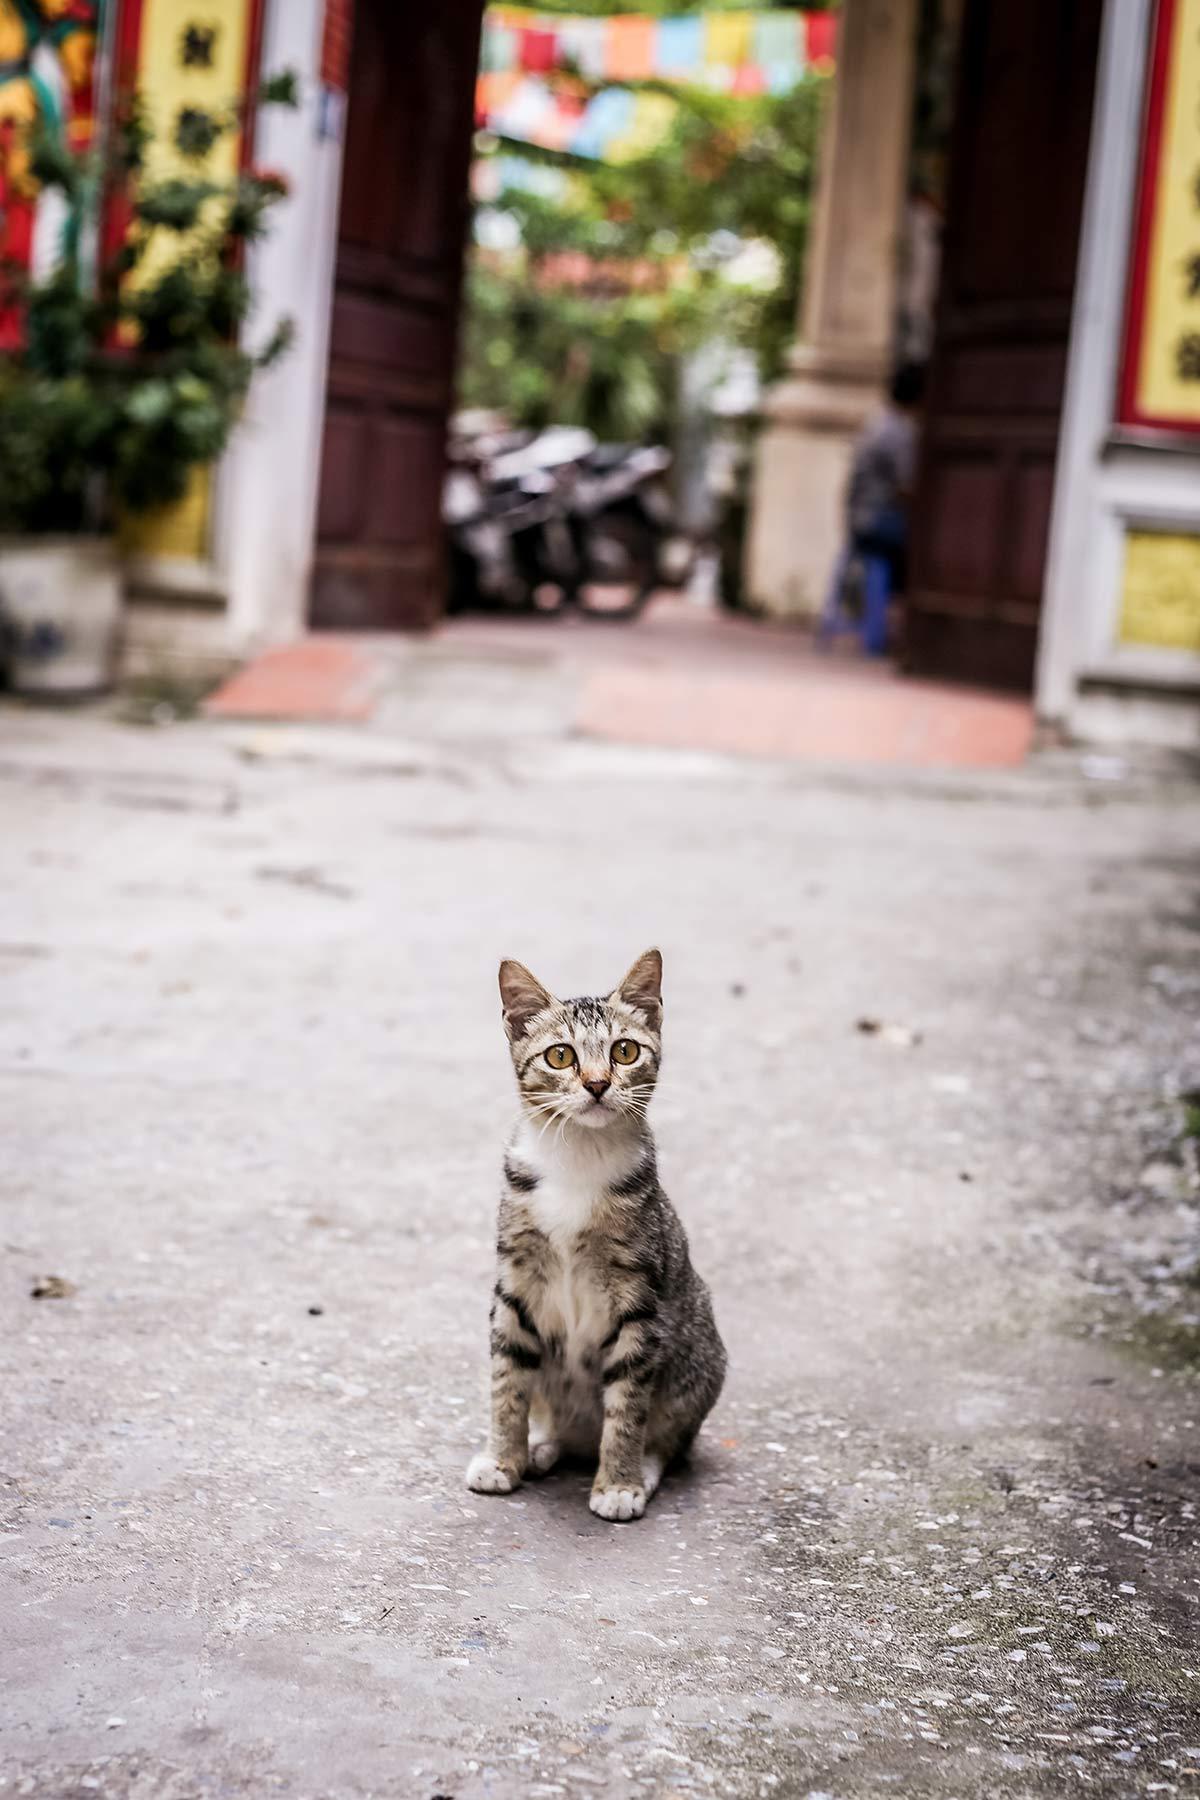 Katze vor der Chua Bat Mau Pagode in Hanoi